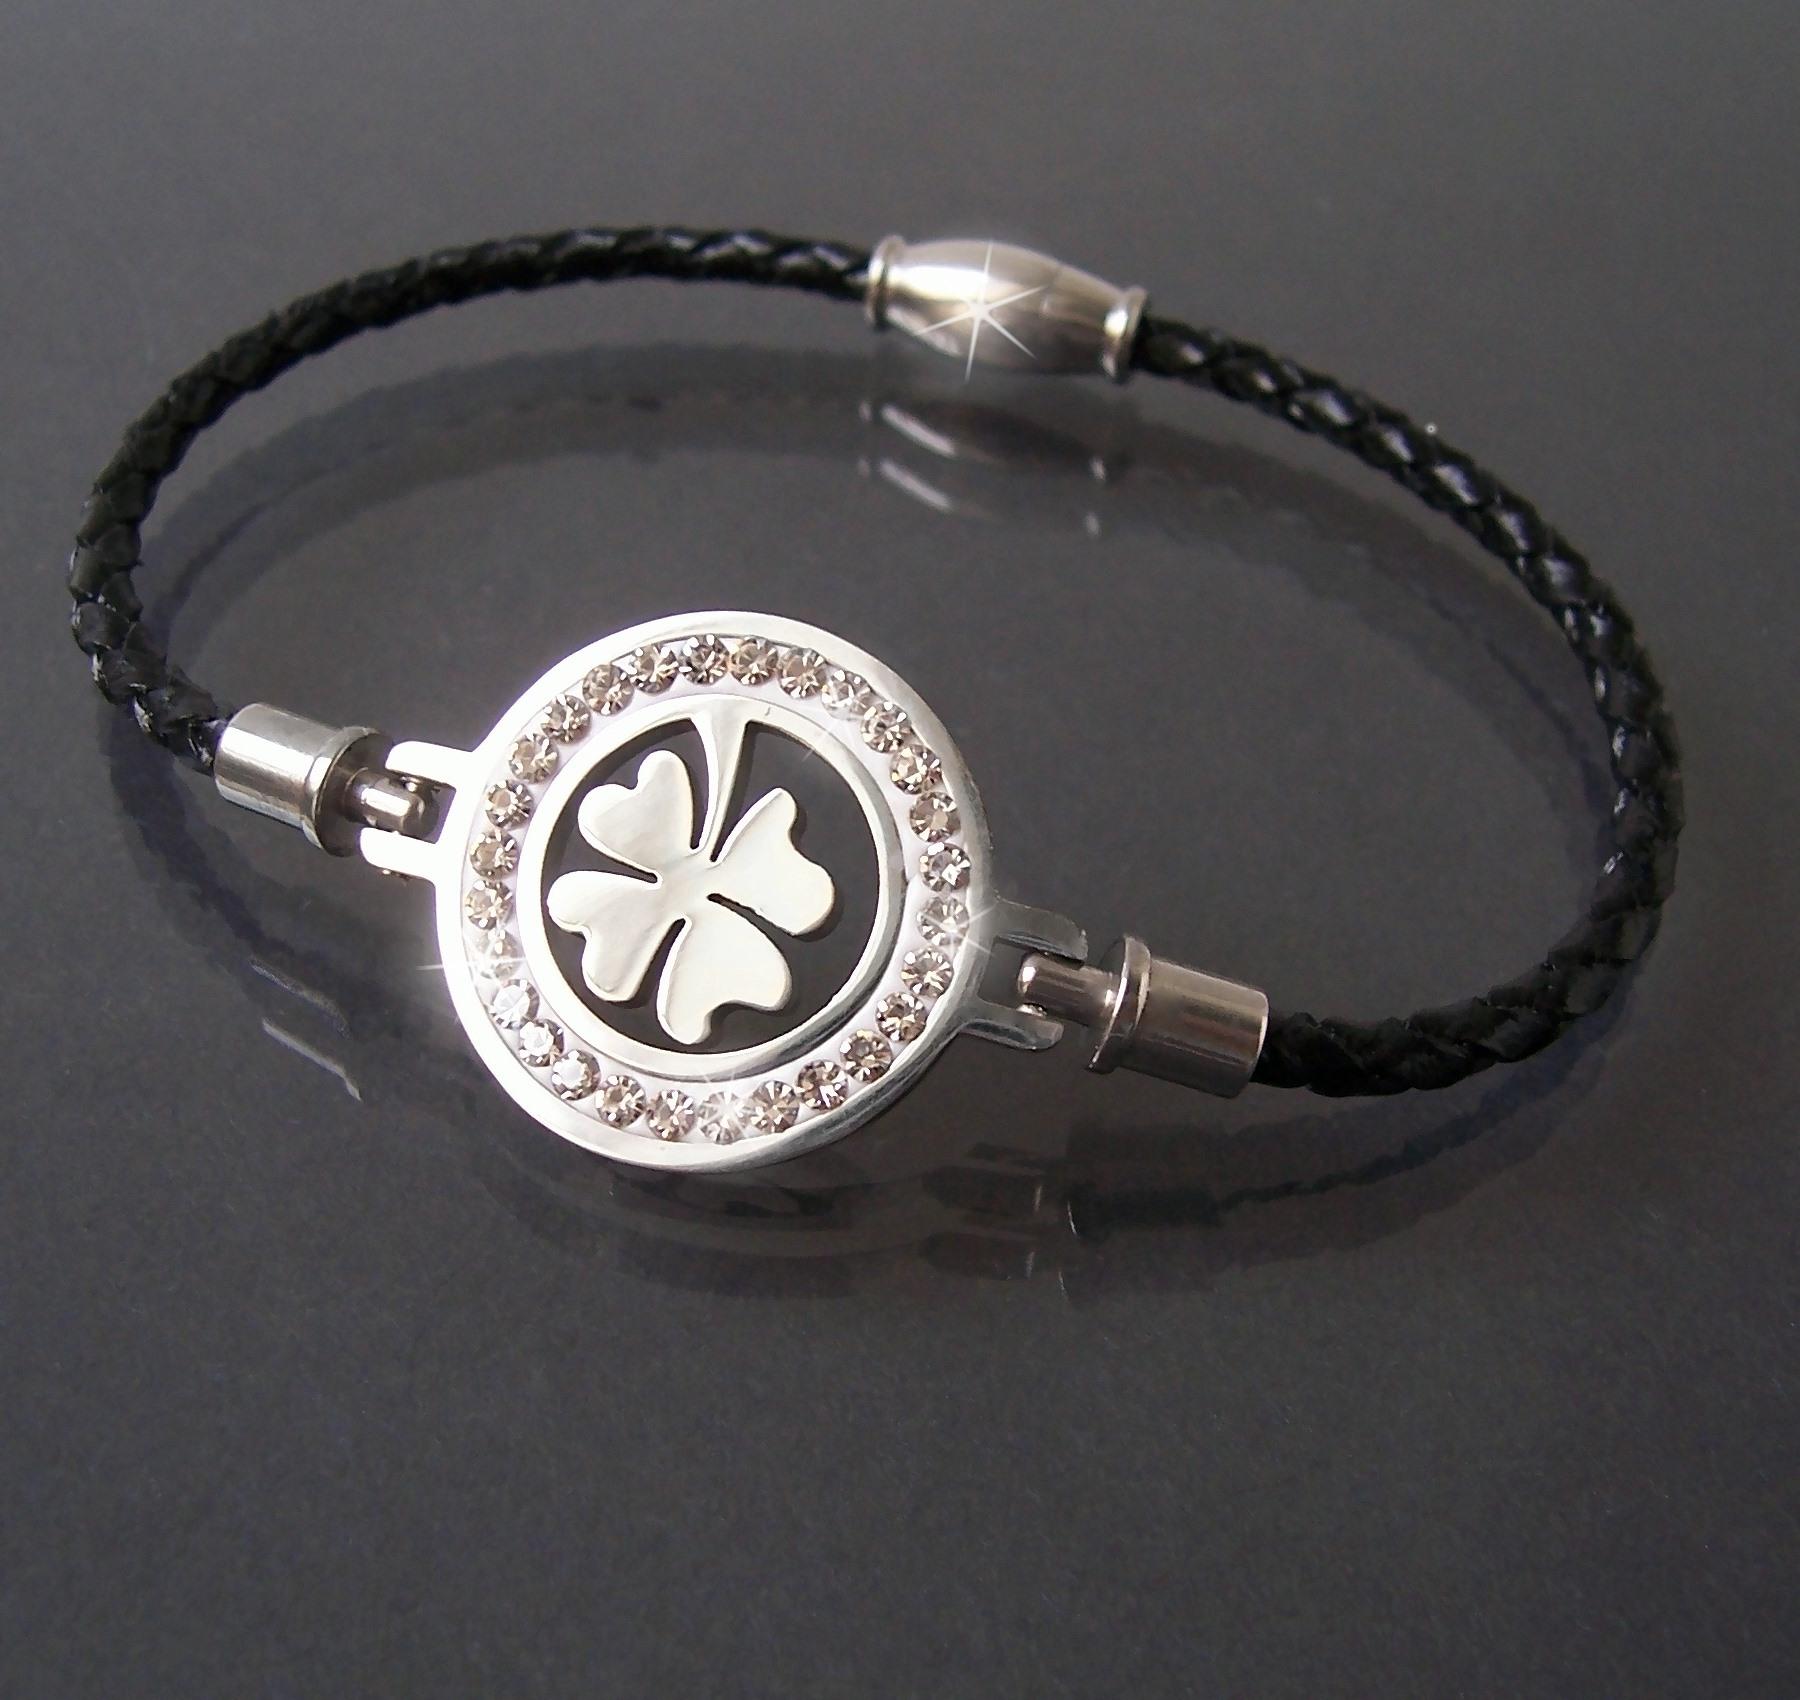 Armband Leder schwarz Edelstahl Magnet Kleeblatt silber Strass A77761